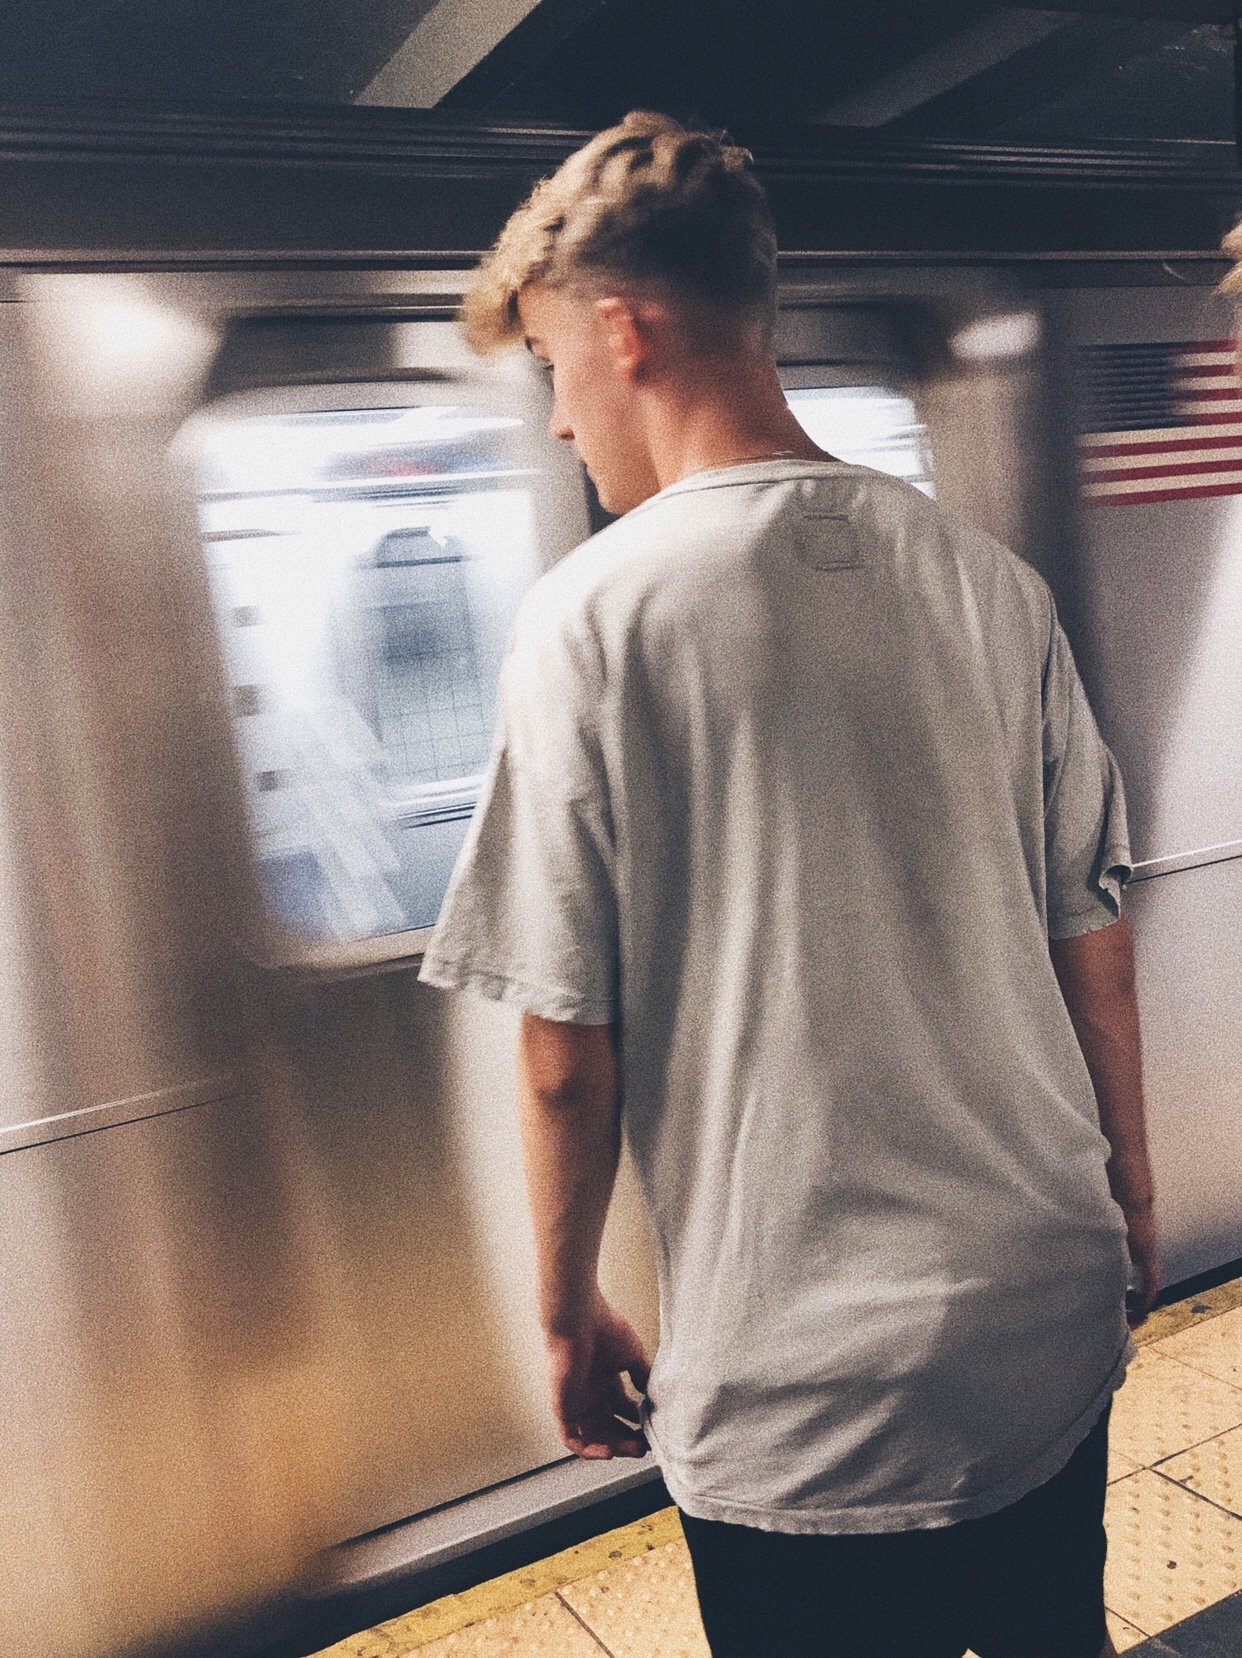 4 Tage in New York City - Subway - Nowshine Reiseblog ü 40